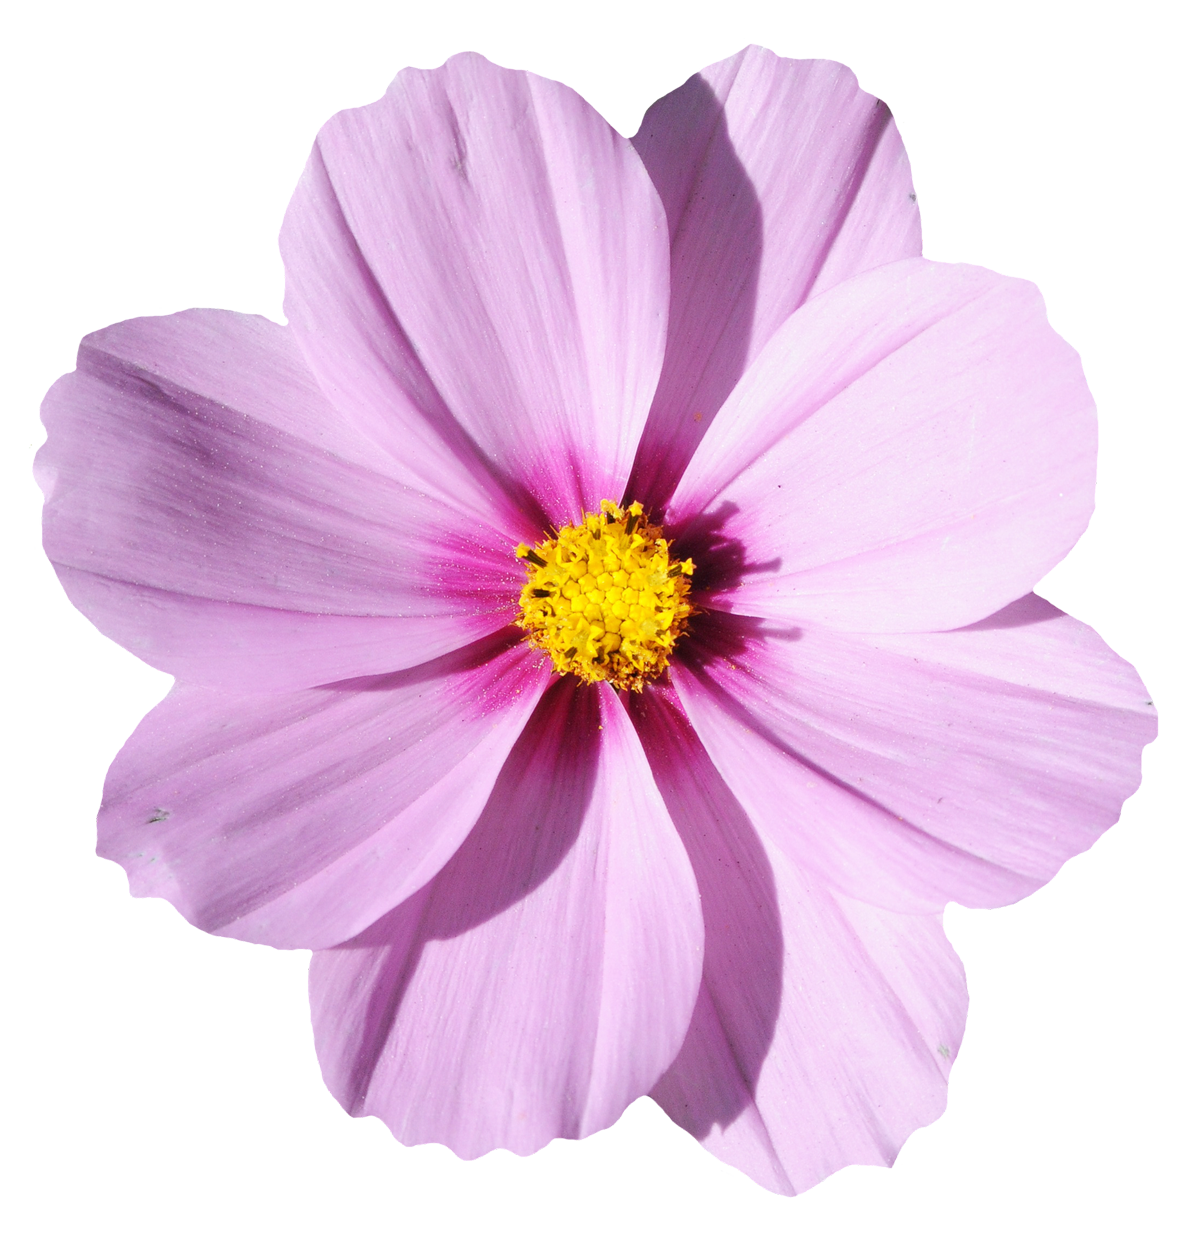 Blossom Flower PNG Image